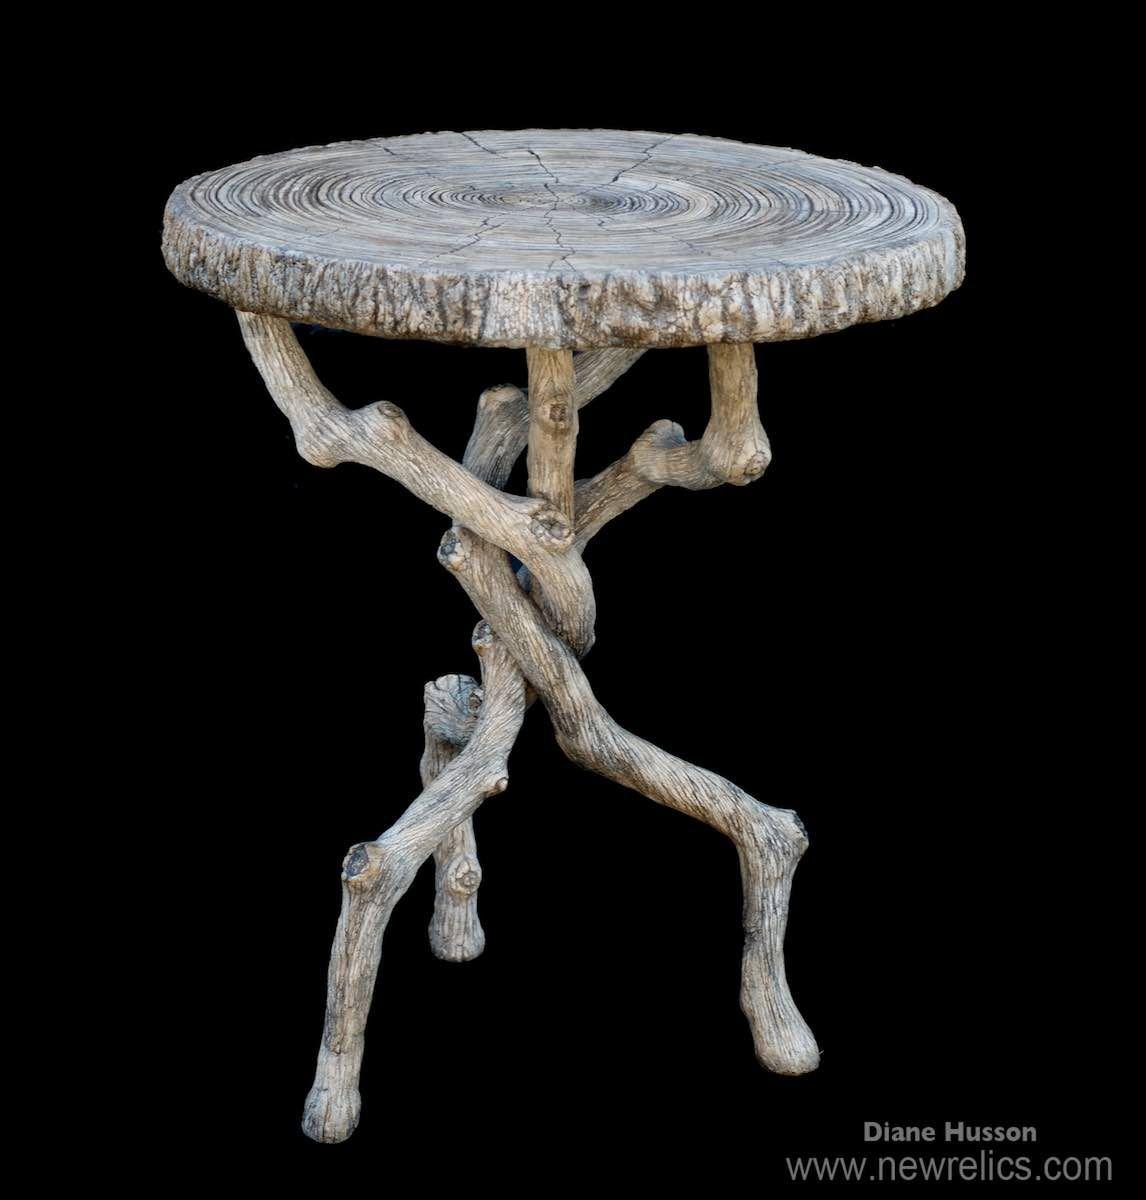 Concrete Faux Bois Outdoor Garden Bistro Table By Sculptor Diane Husson